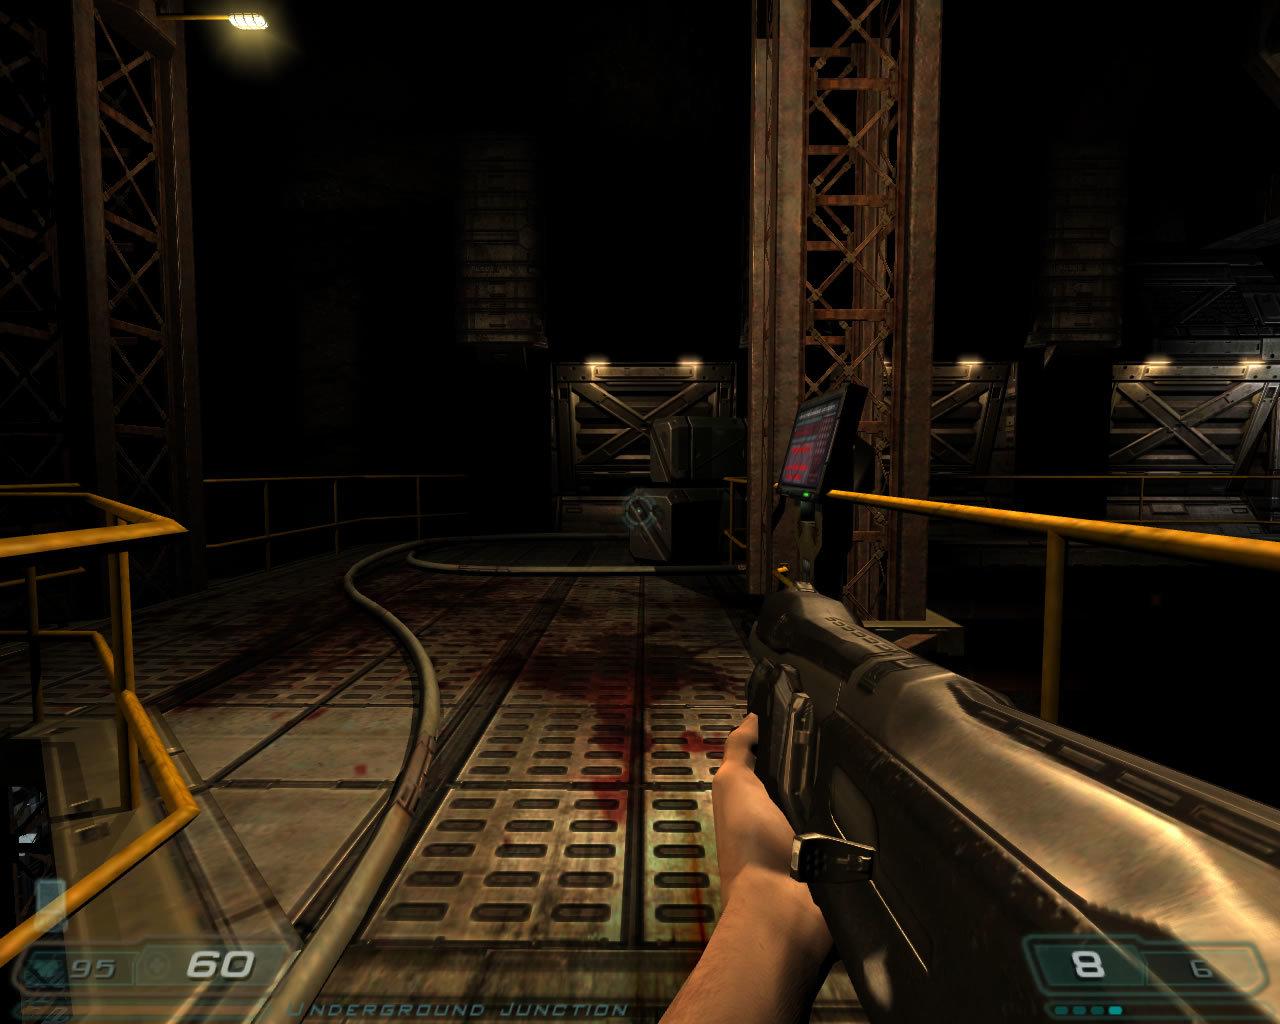 Doom 3 High Quality w/ 4x AA